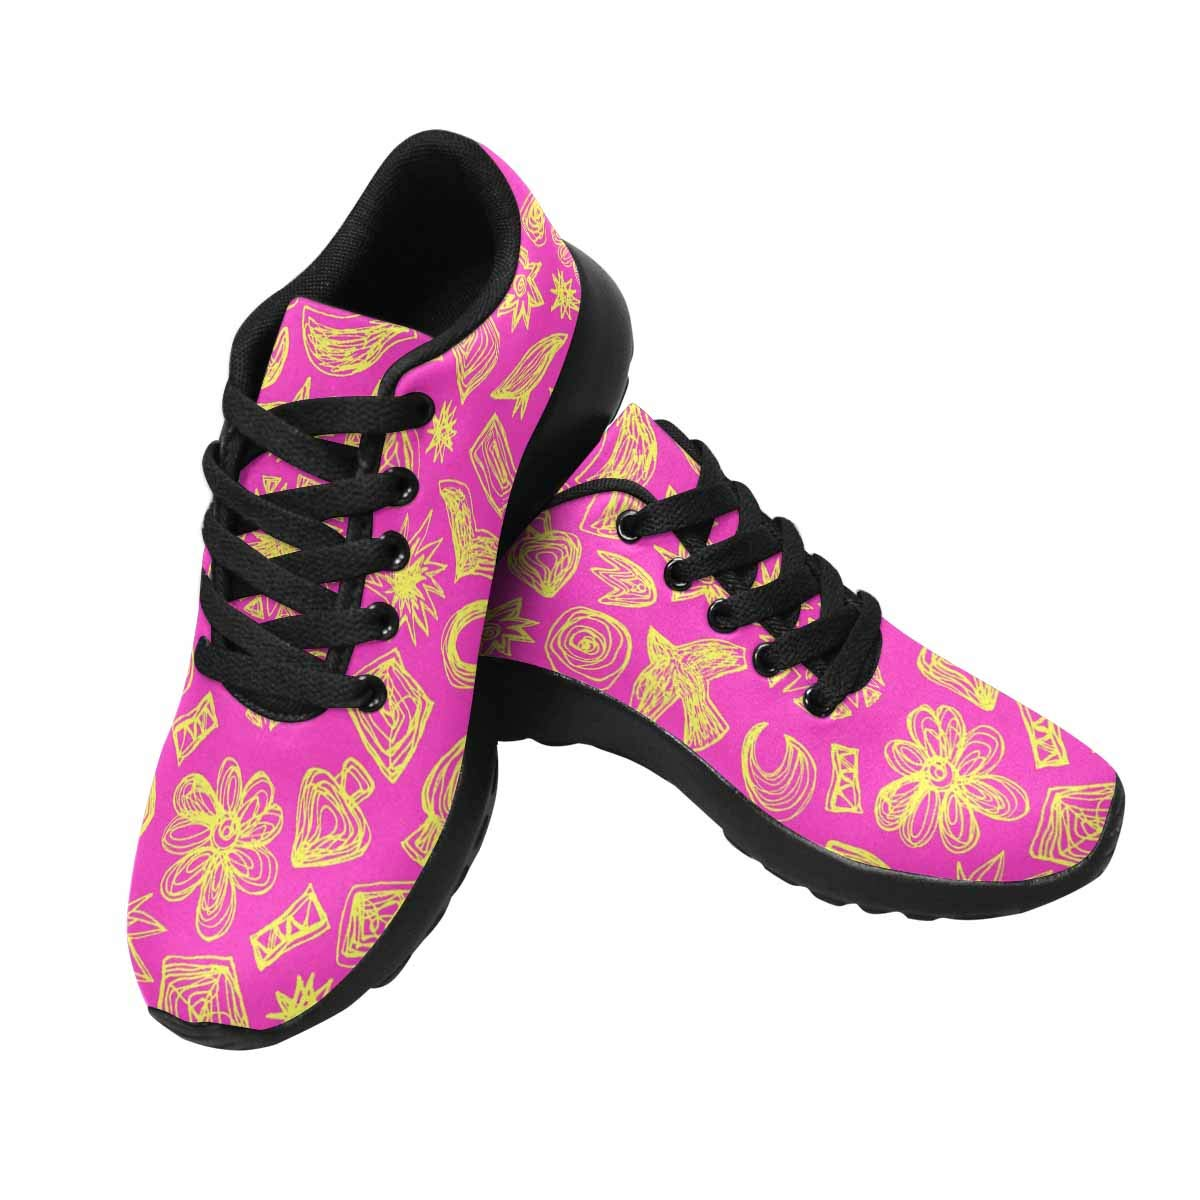 INTERESTPRINT Womens Running Shoes Pink Doodle Pattern Print Outdoor Sneakers